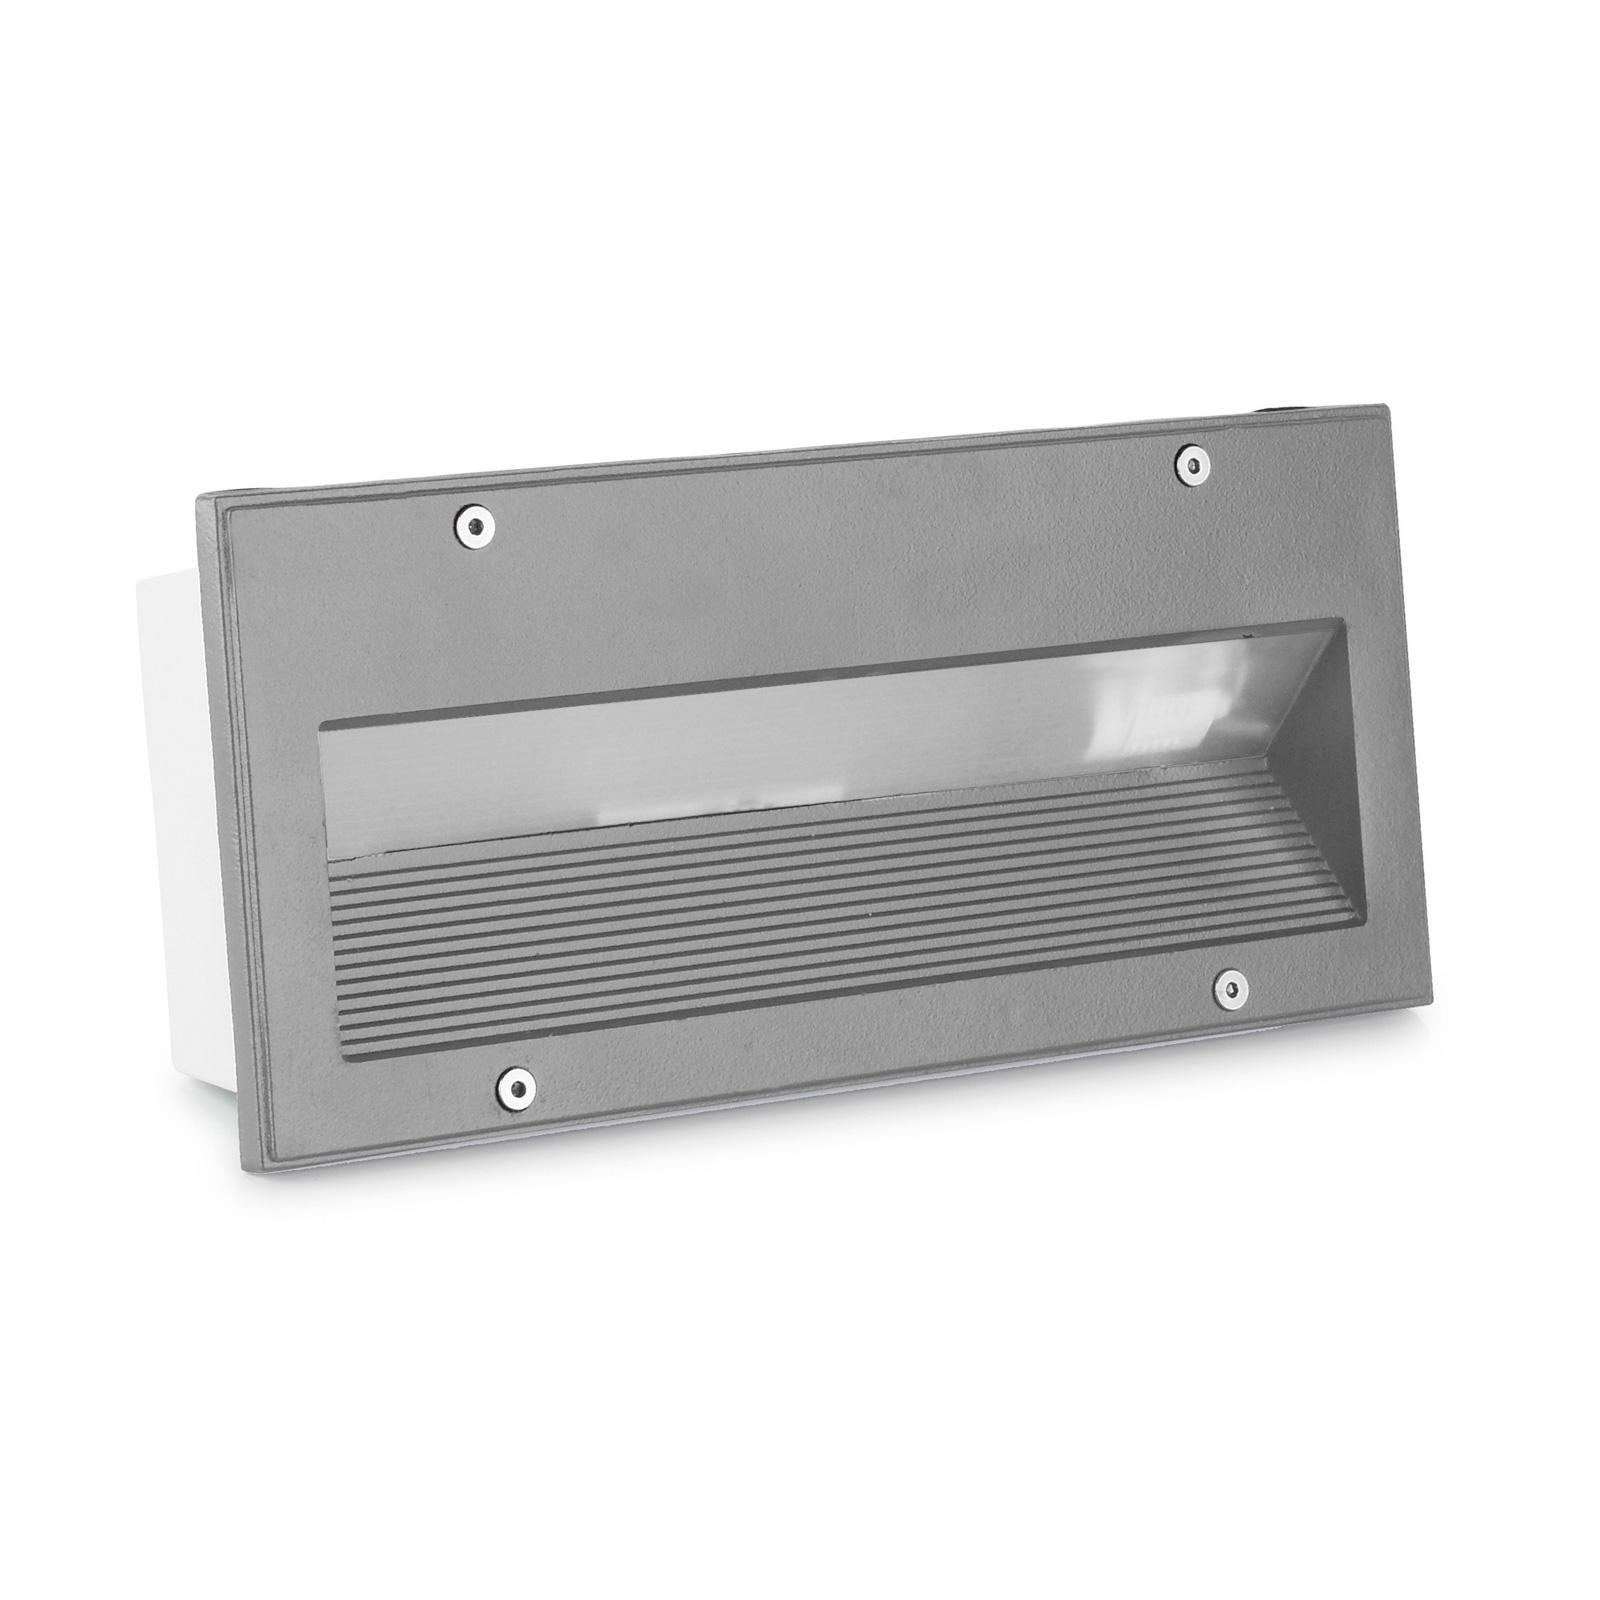 LEDS-C4 Micenas Einbauleuchte, 25,5x11,5 cm, grau